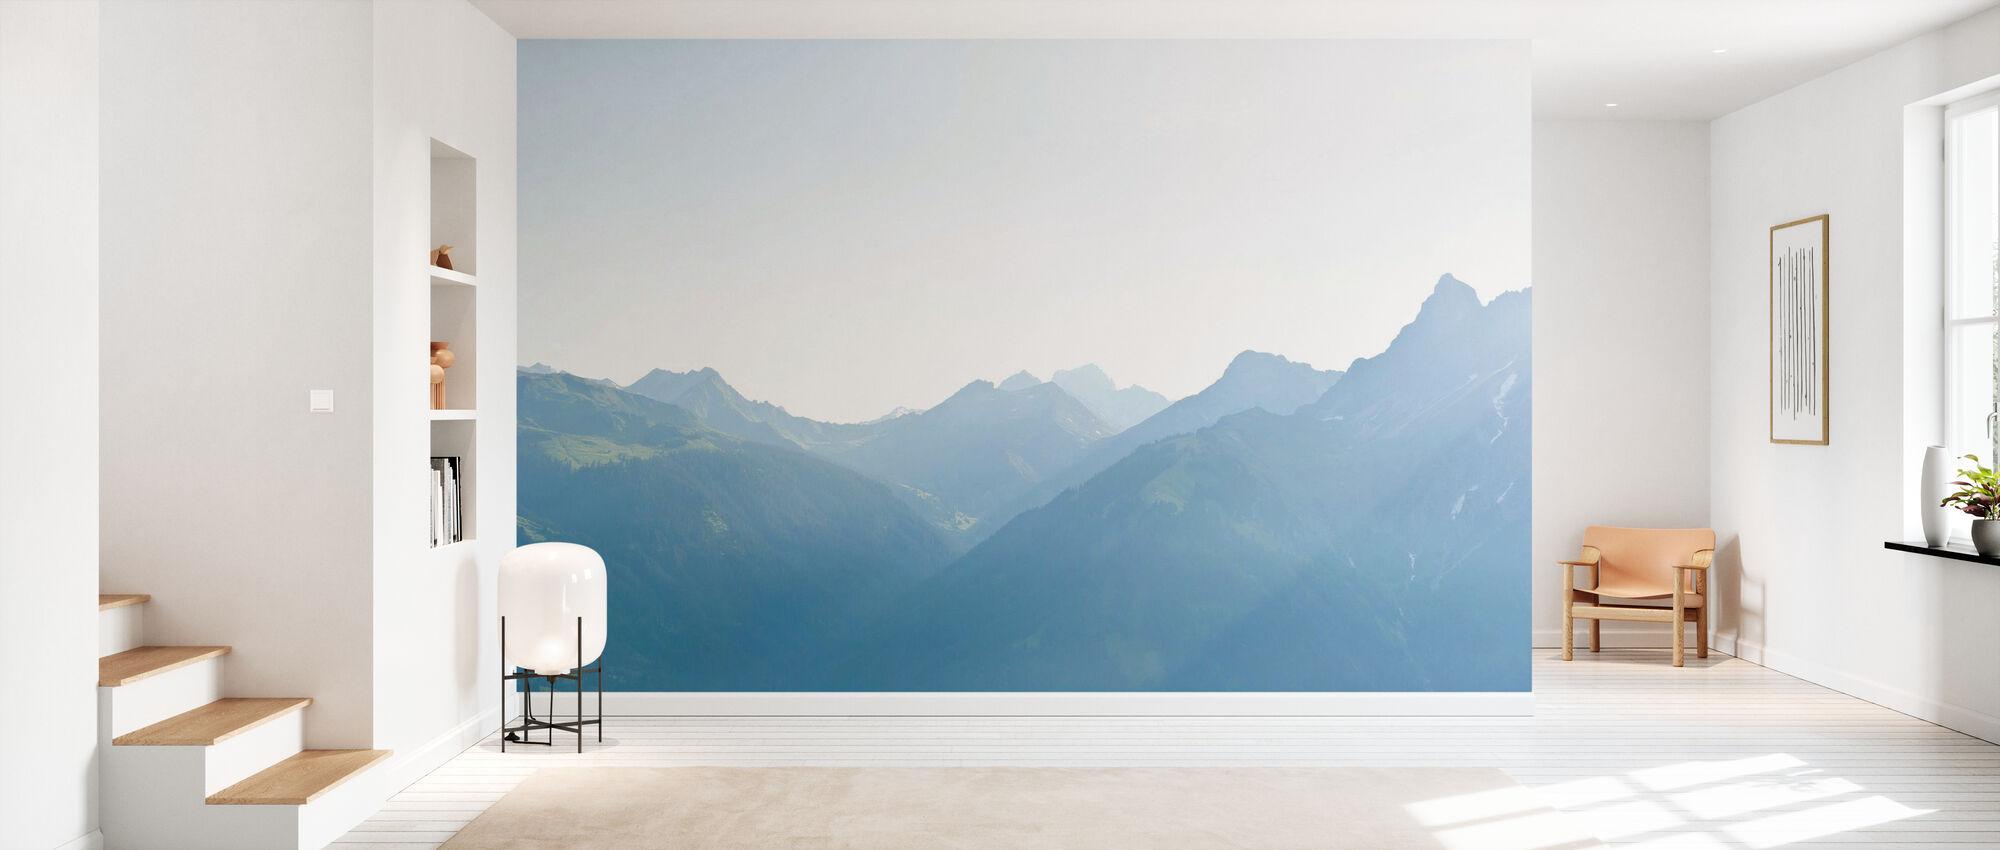 Vorarlberg, Austria - Tapet - Hall